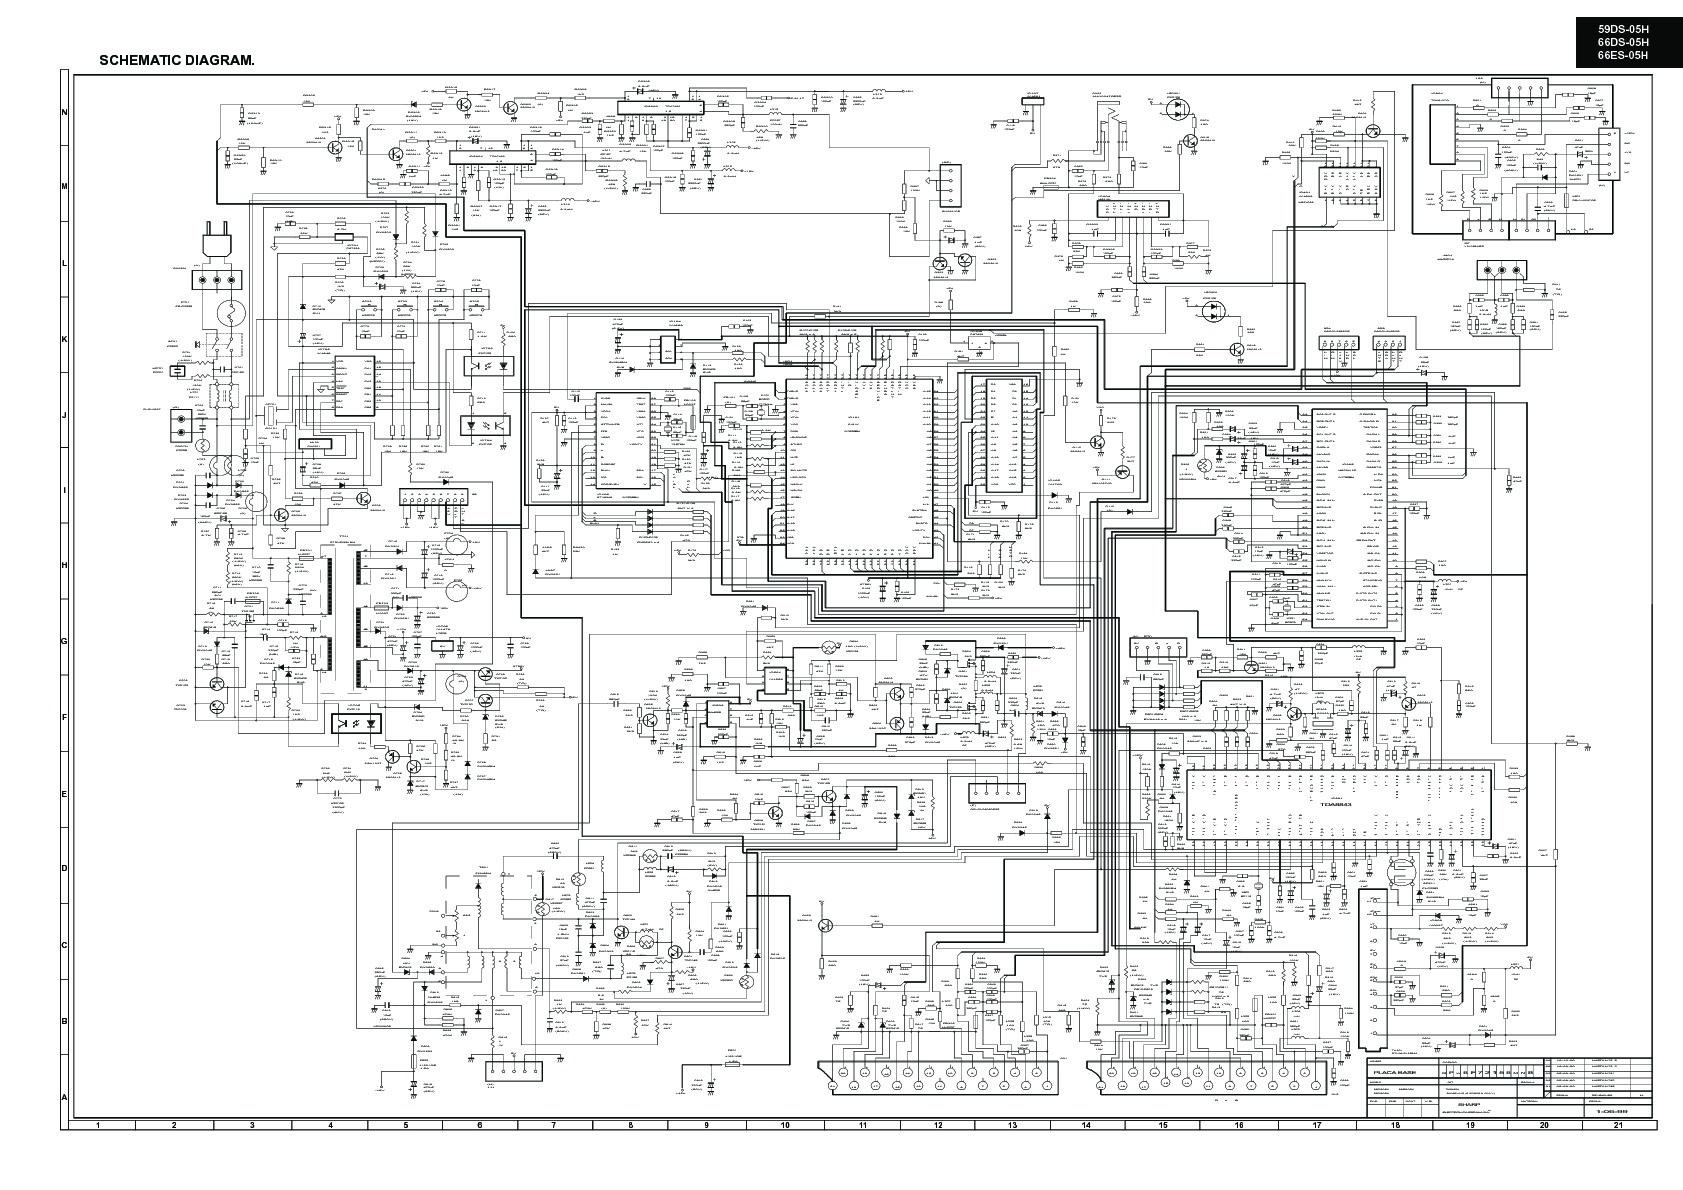 sharp 66ds-05h  serv man38  technical bulletin